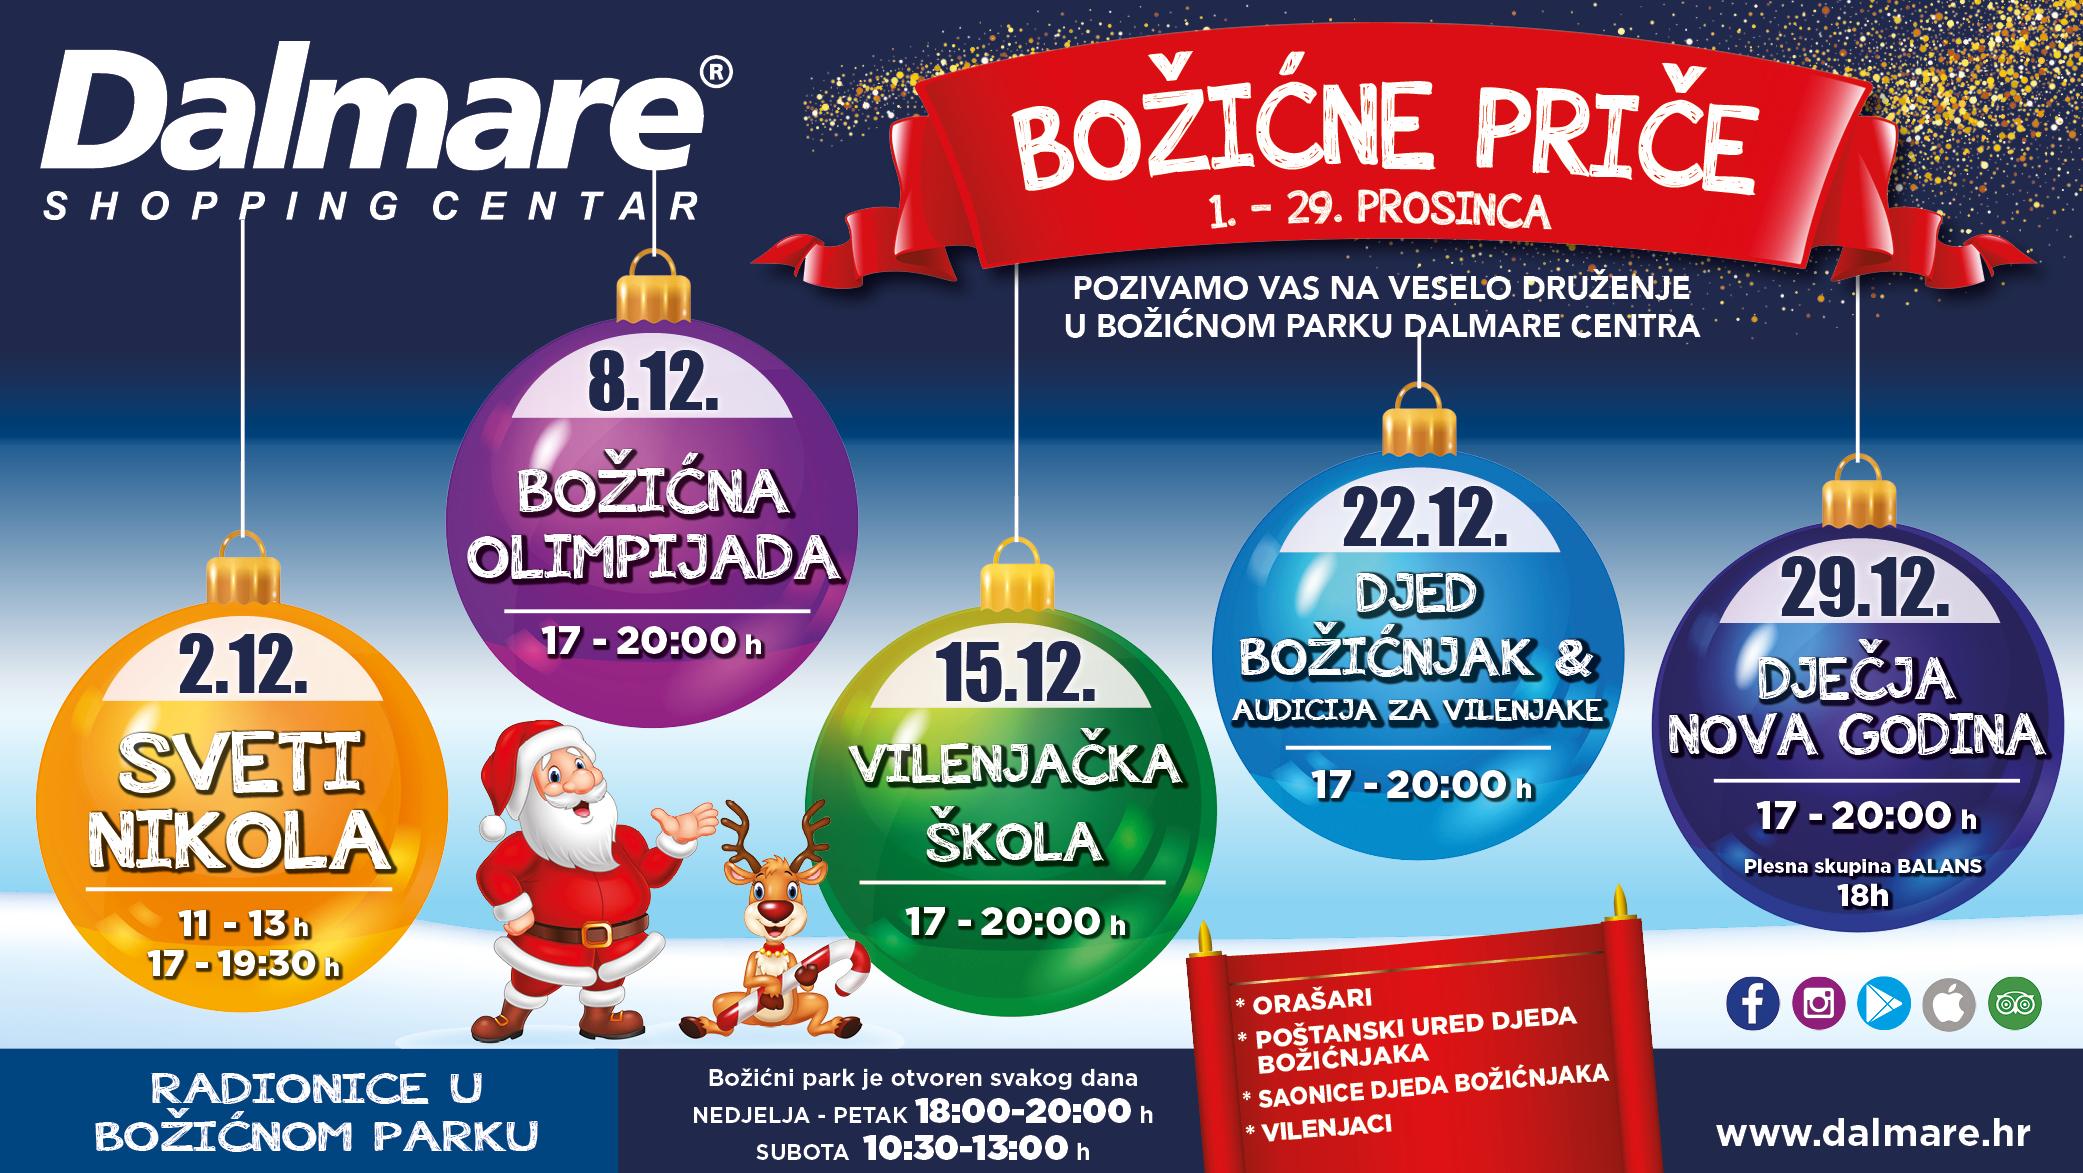 Božićne priče u Dalmare centru..